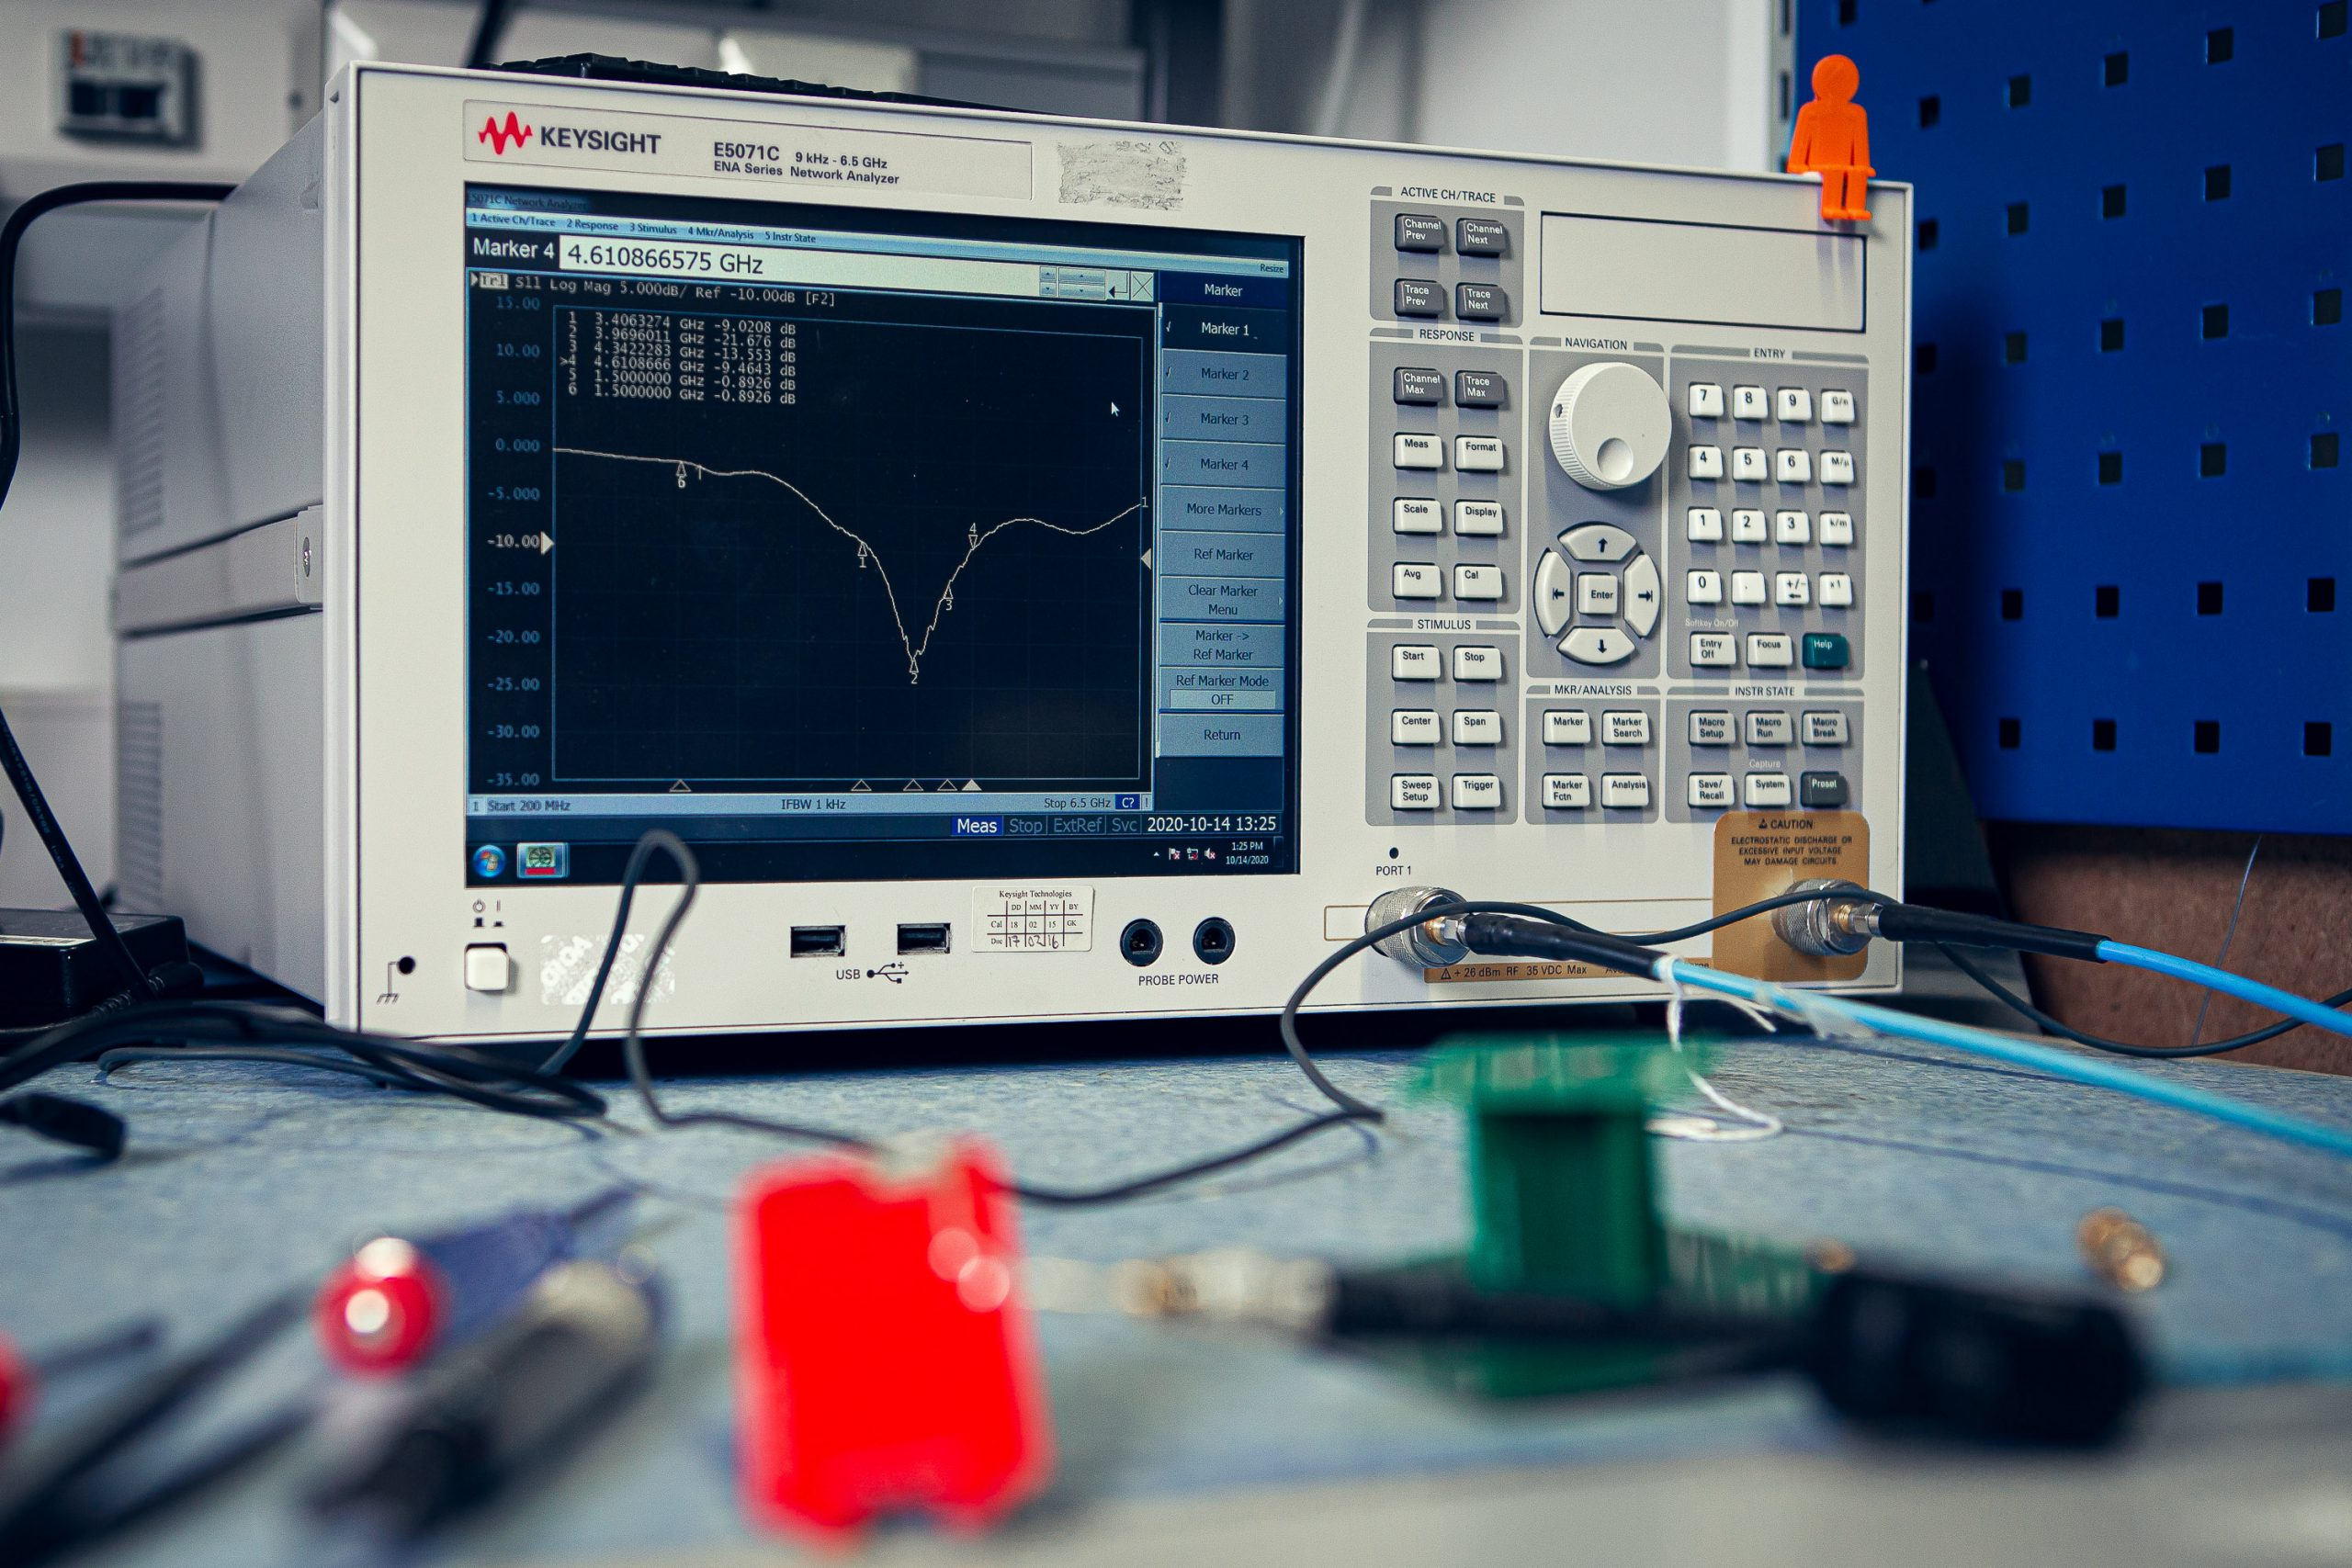 Antenna passive tuning and anechoic chamber testing